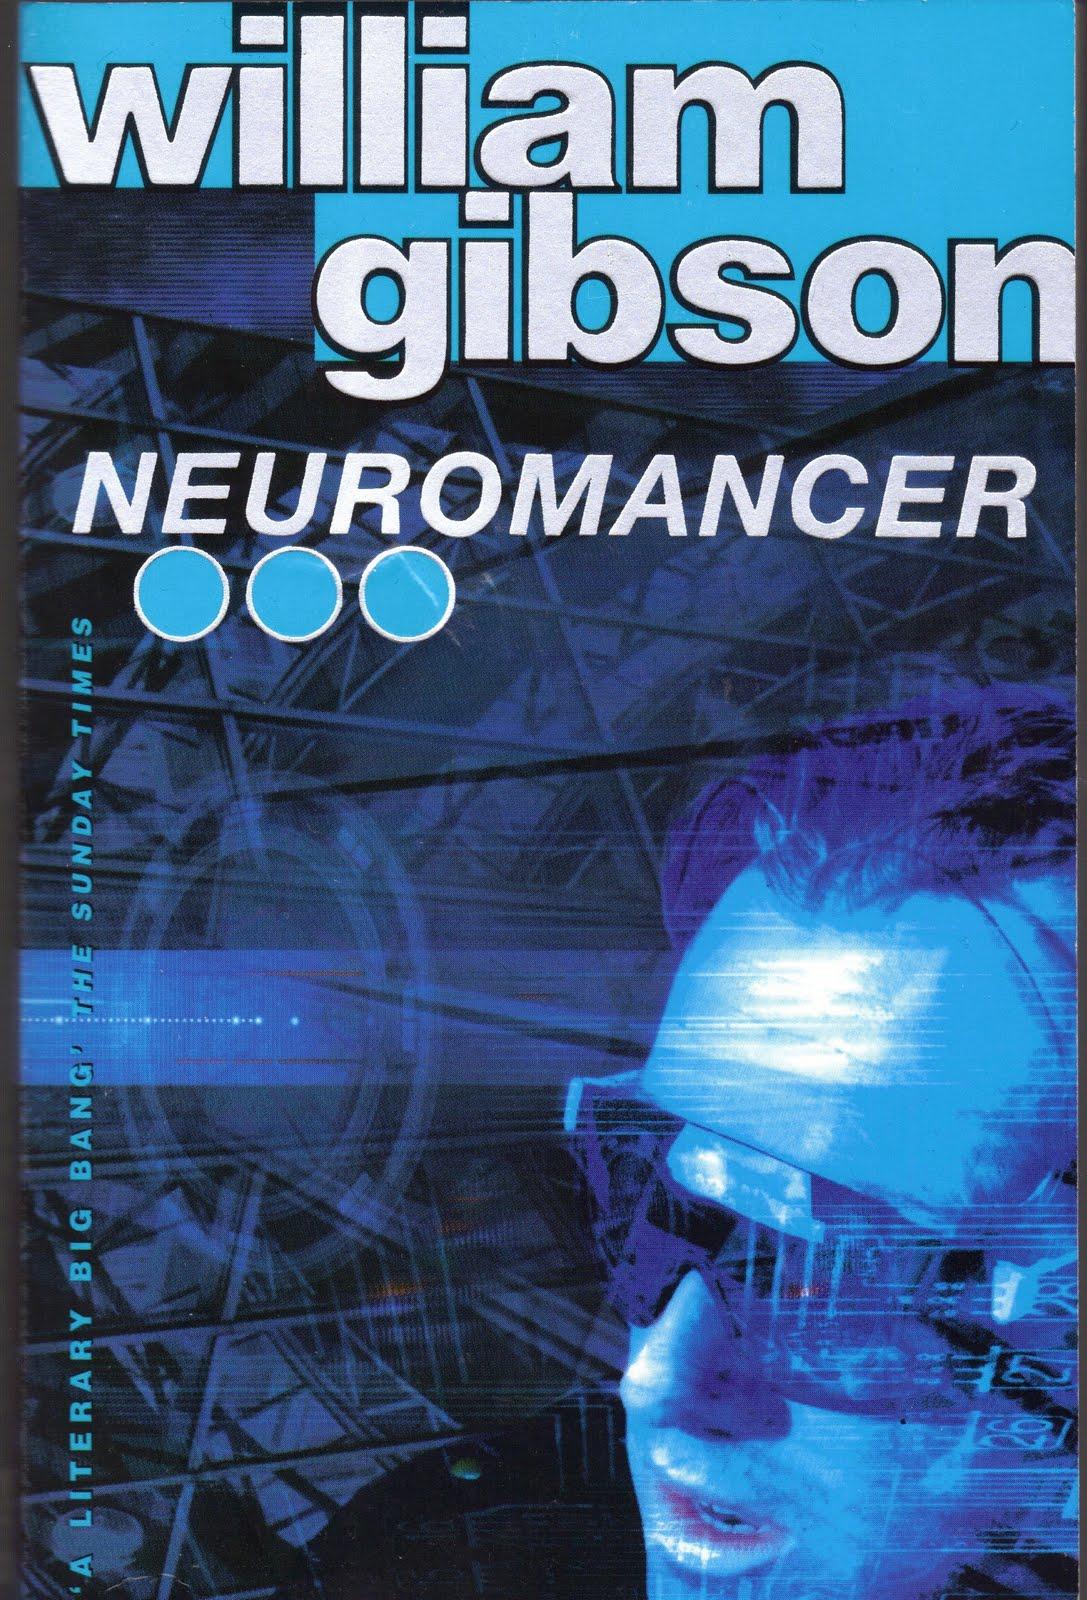 Neuromancer-Trilogie – Wikipedia